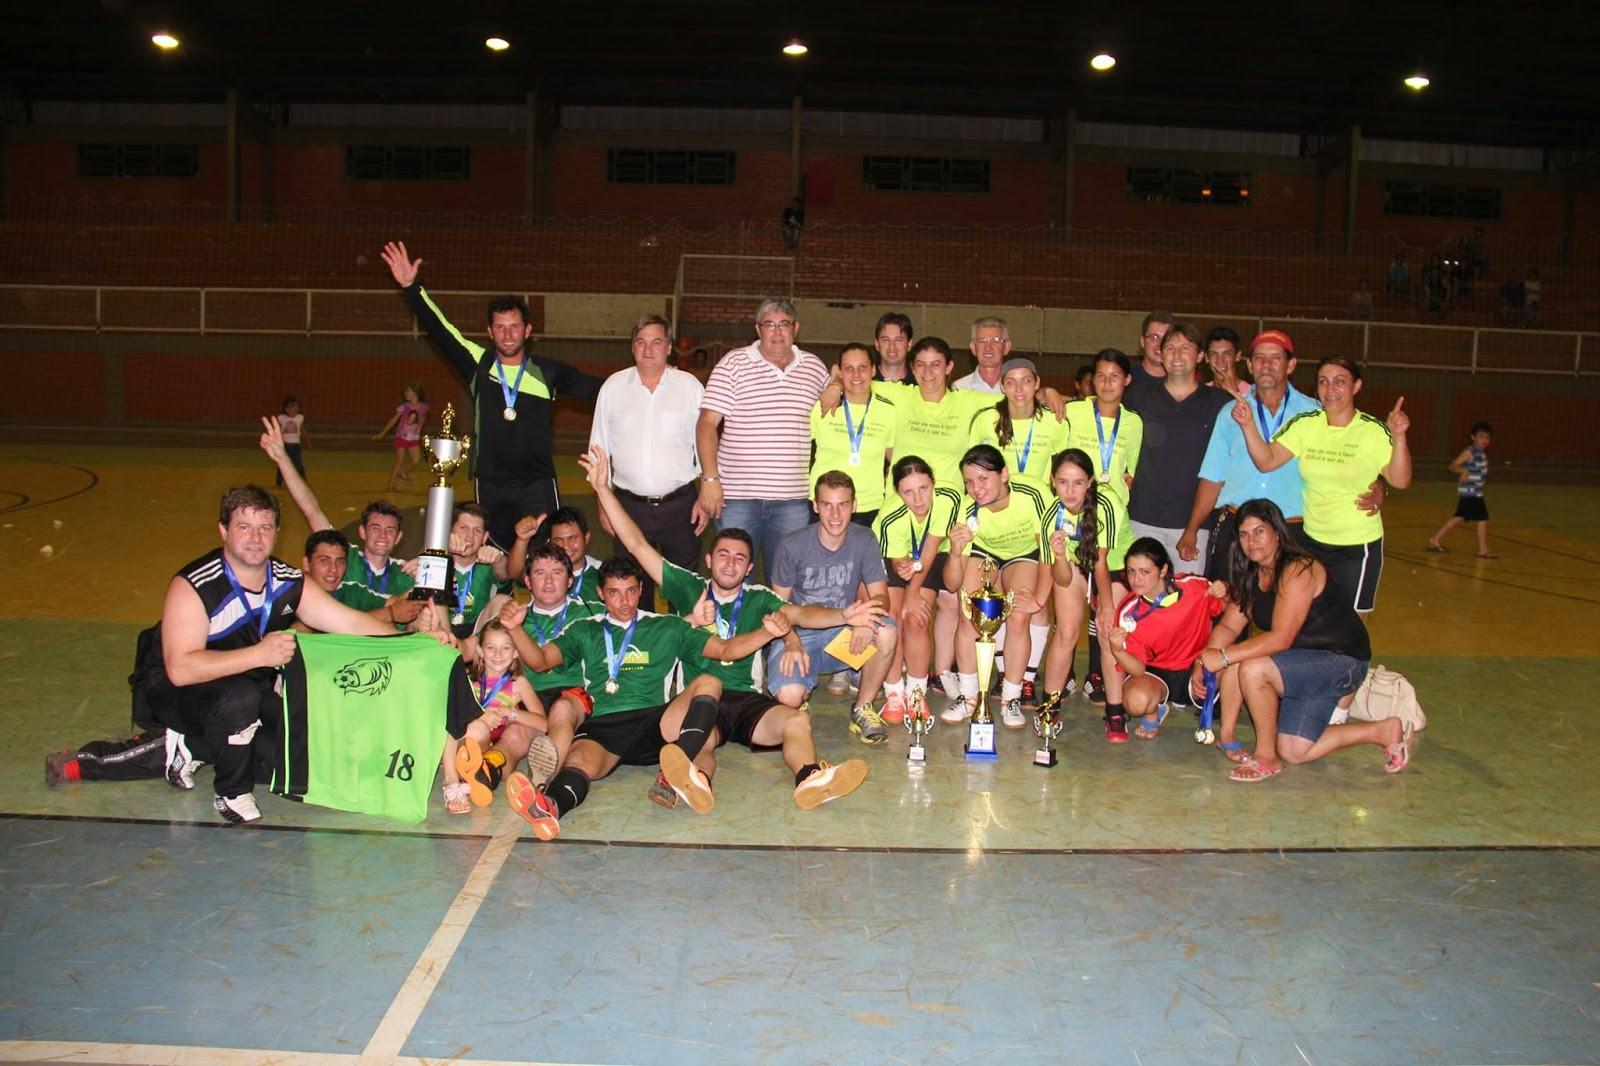 Olho Aberto Paraná  Nova Laranjeiras Abertura do Campeonato ... dff3f5efbf723